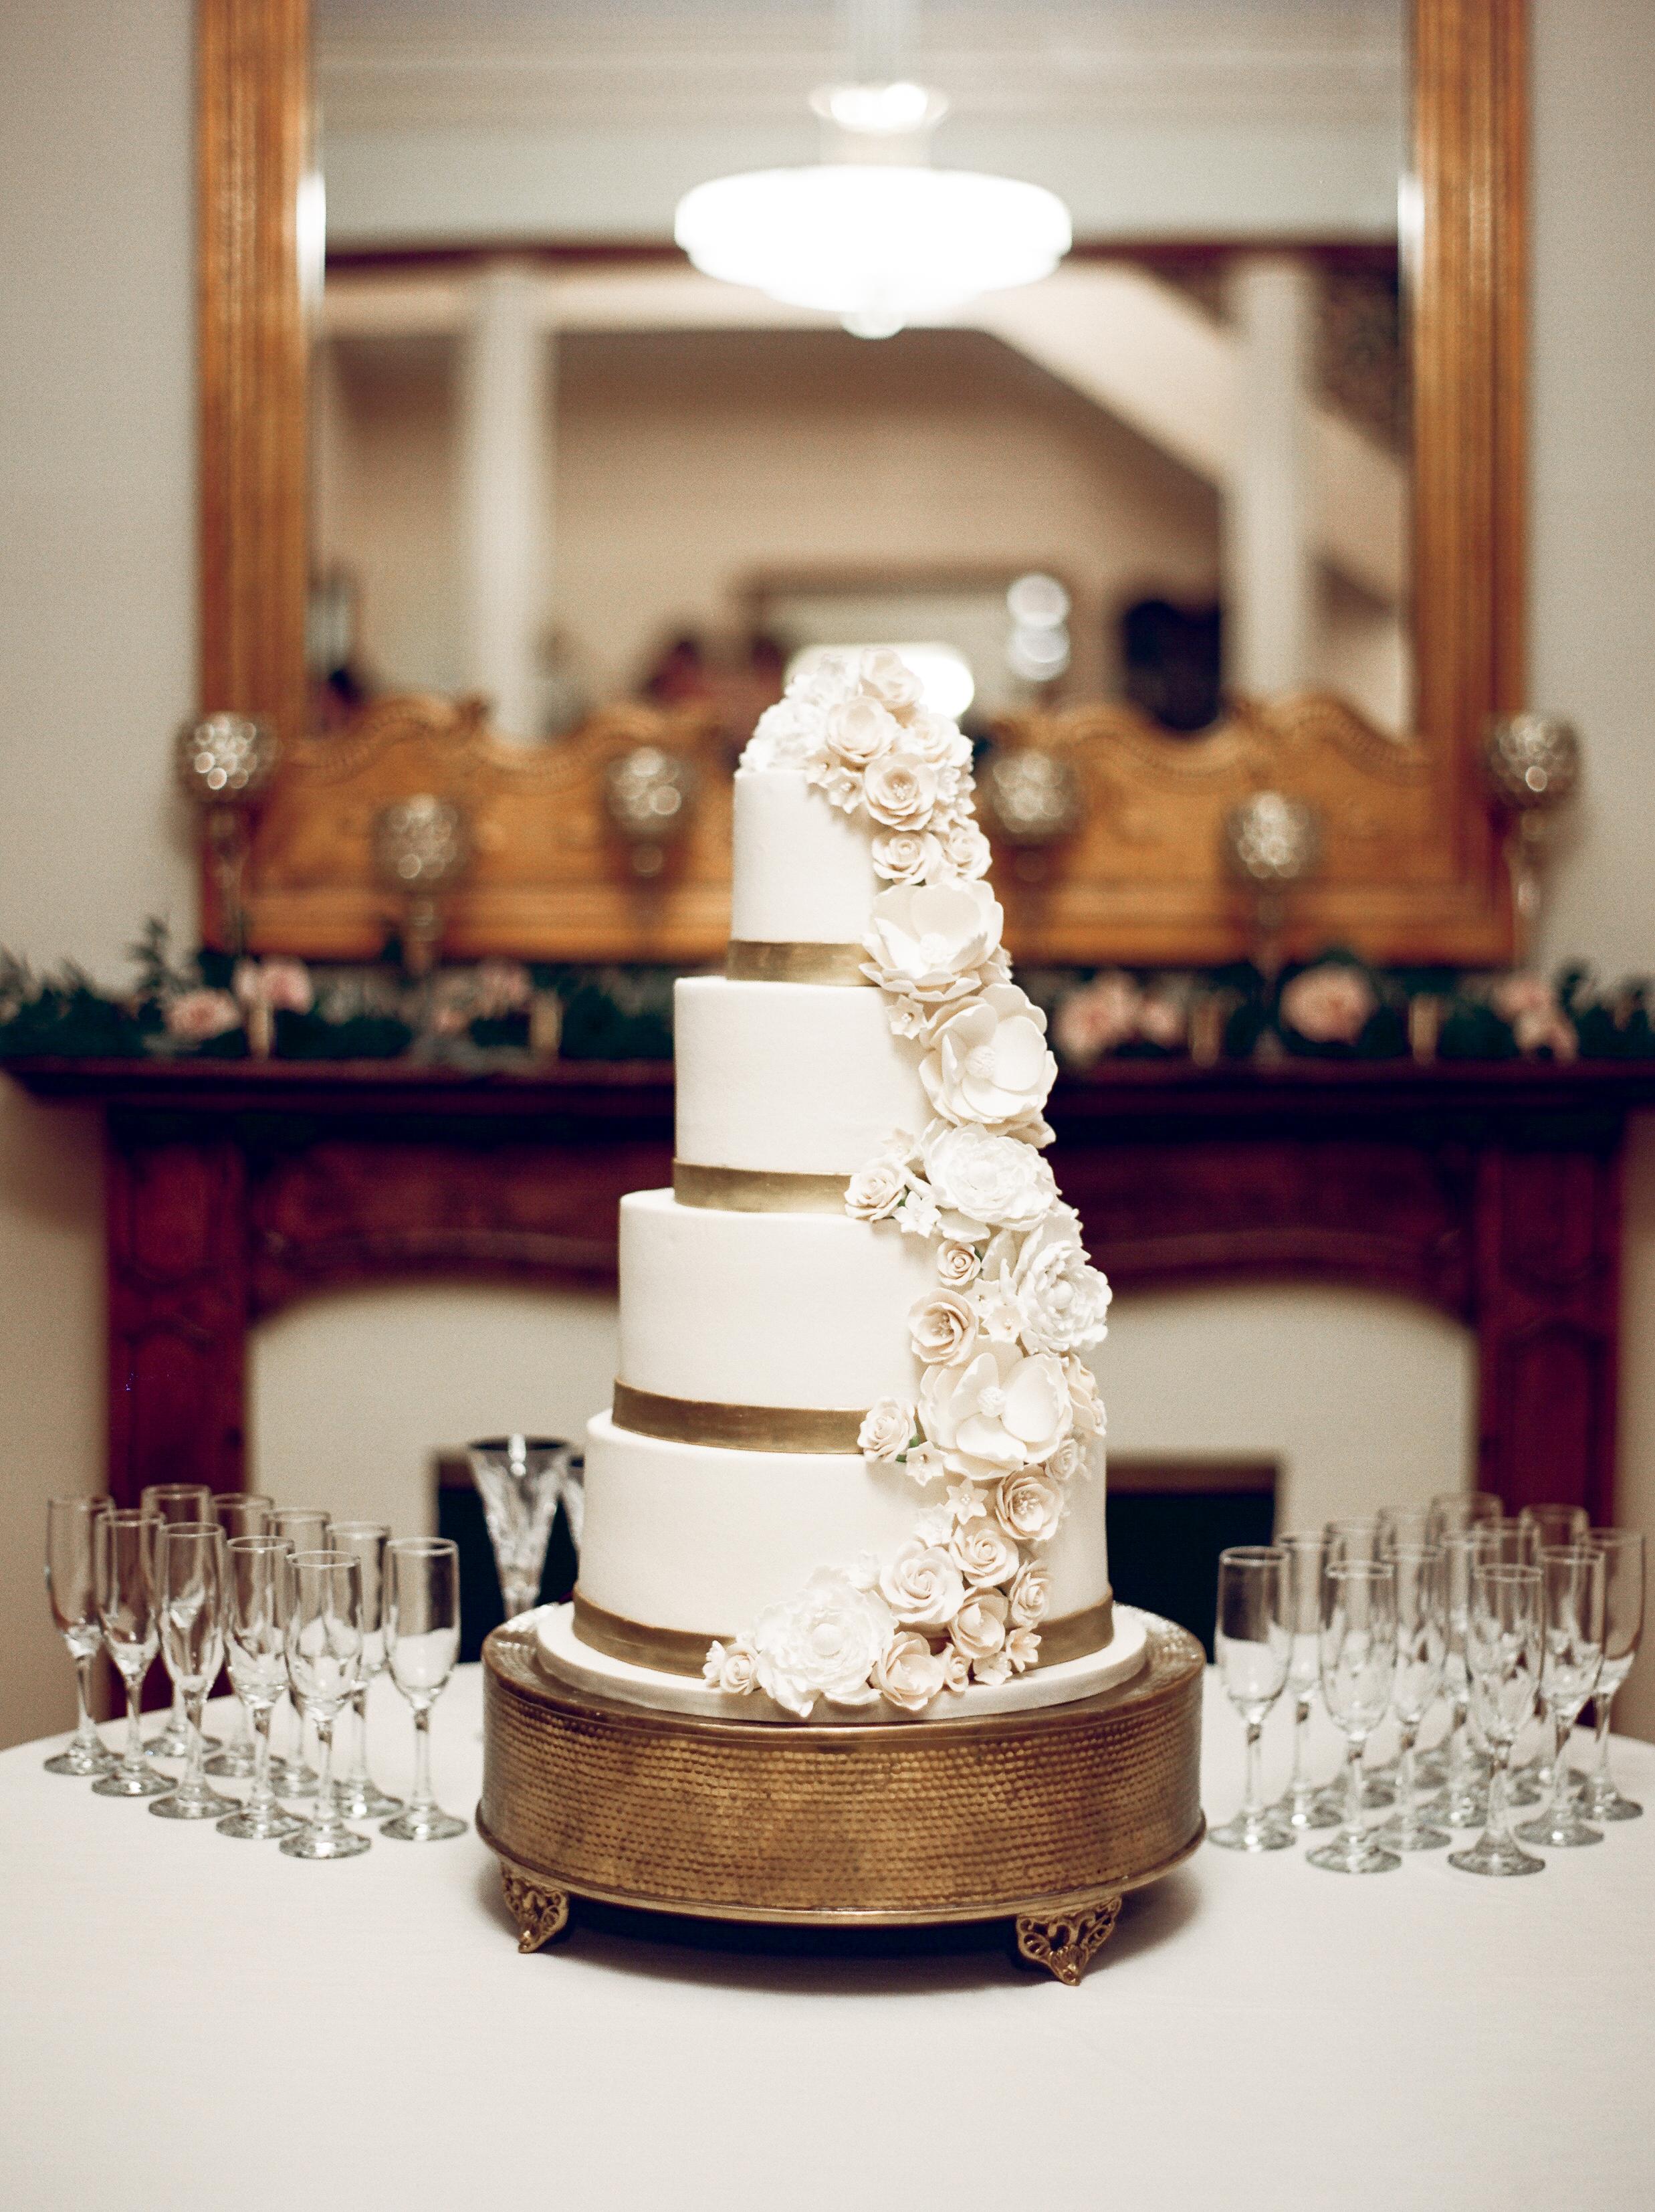 Southern Fete, Southern Wedding, Wedding Cake, Bride's Cake